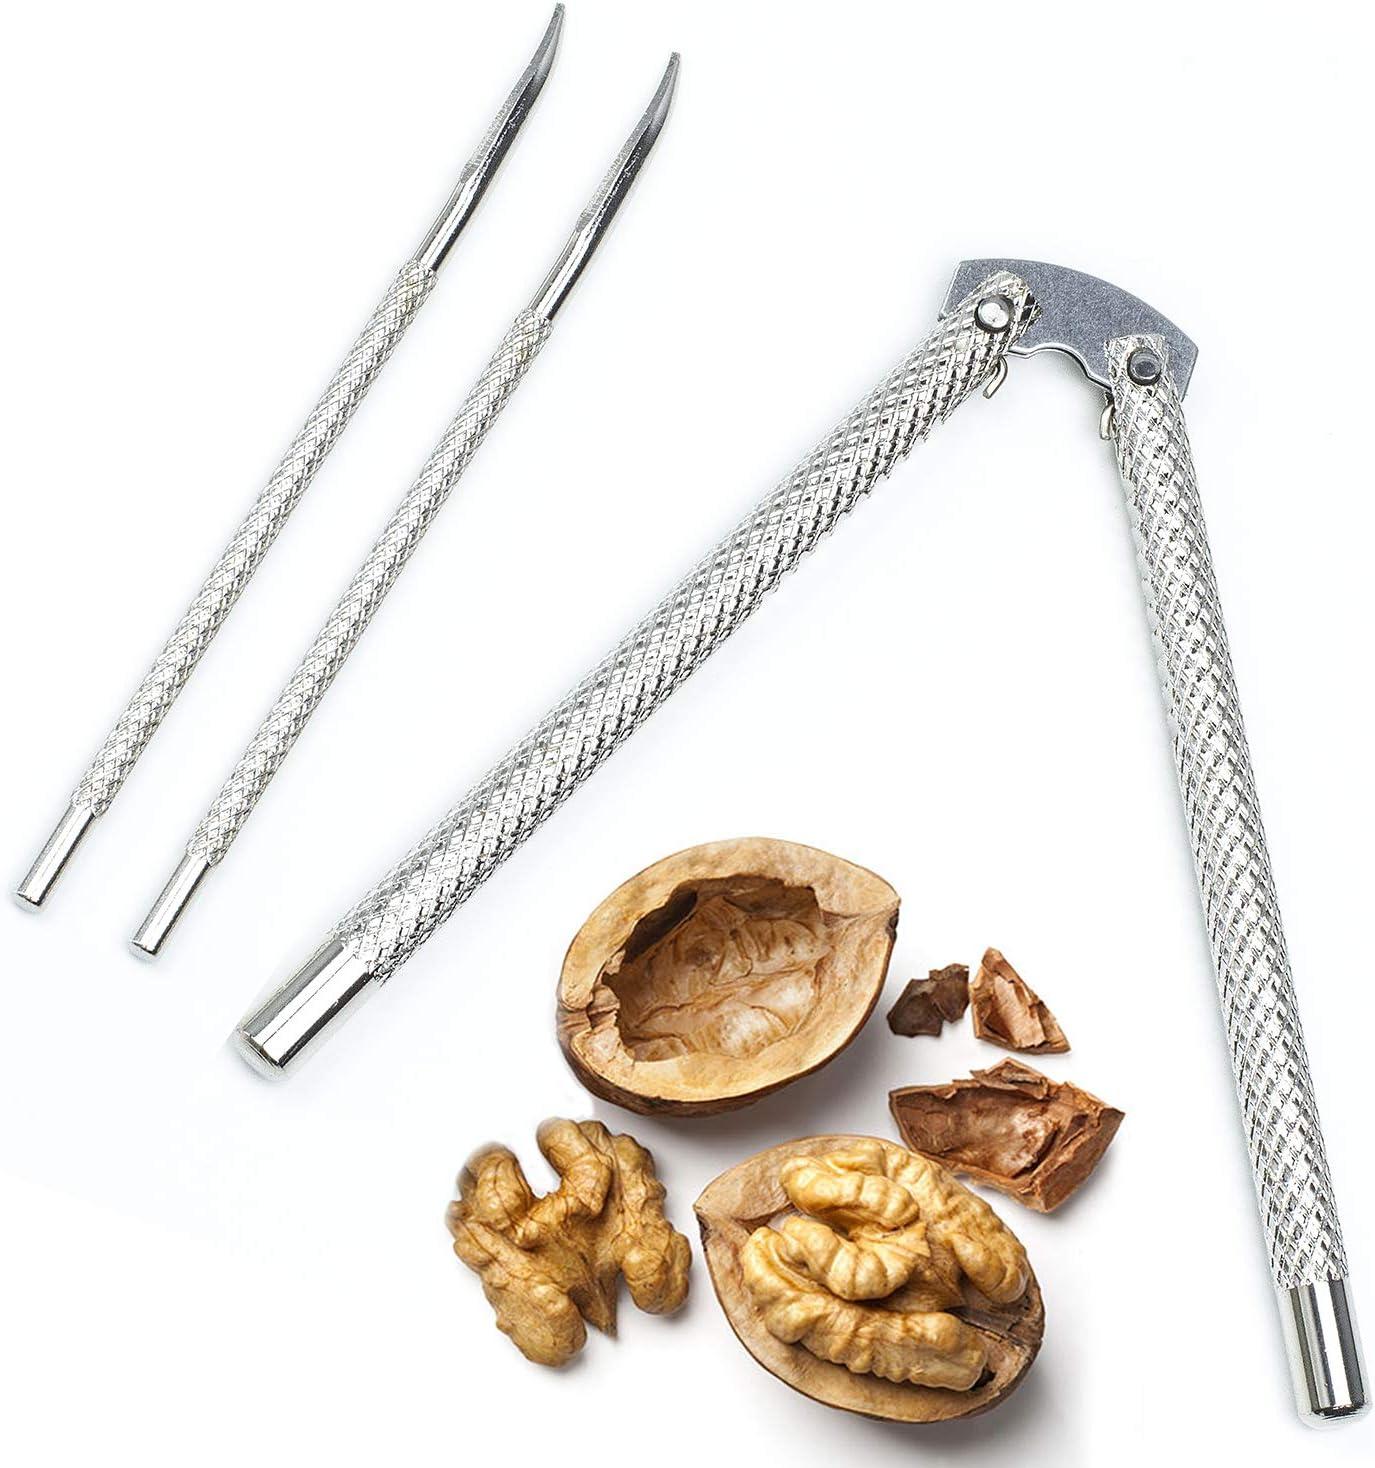 Nut Cracker Set Nutcracker Lobster Tool Crab or Over item New arrival handling